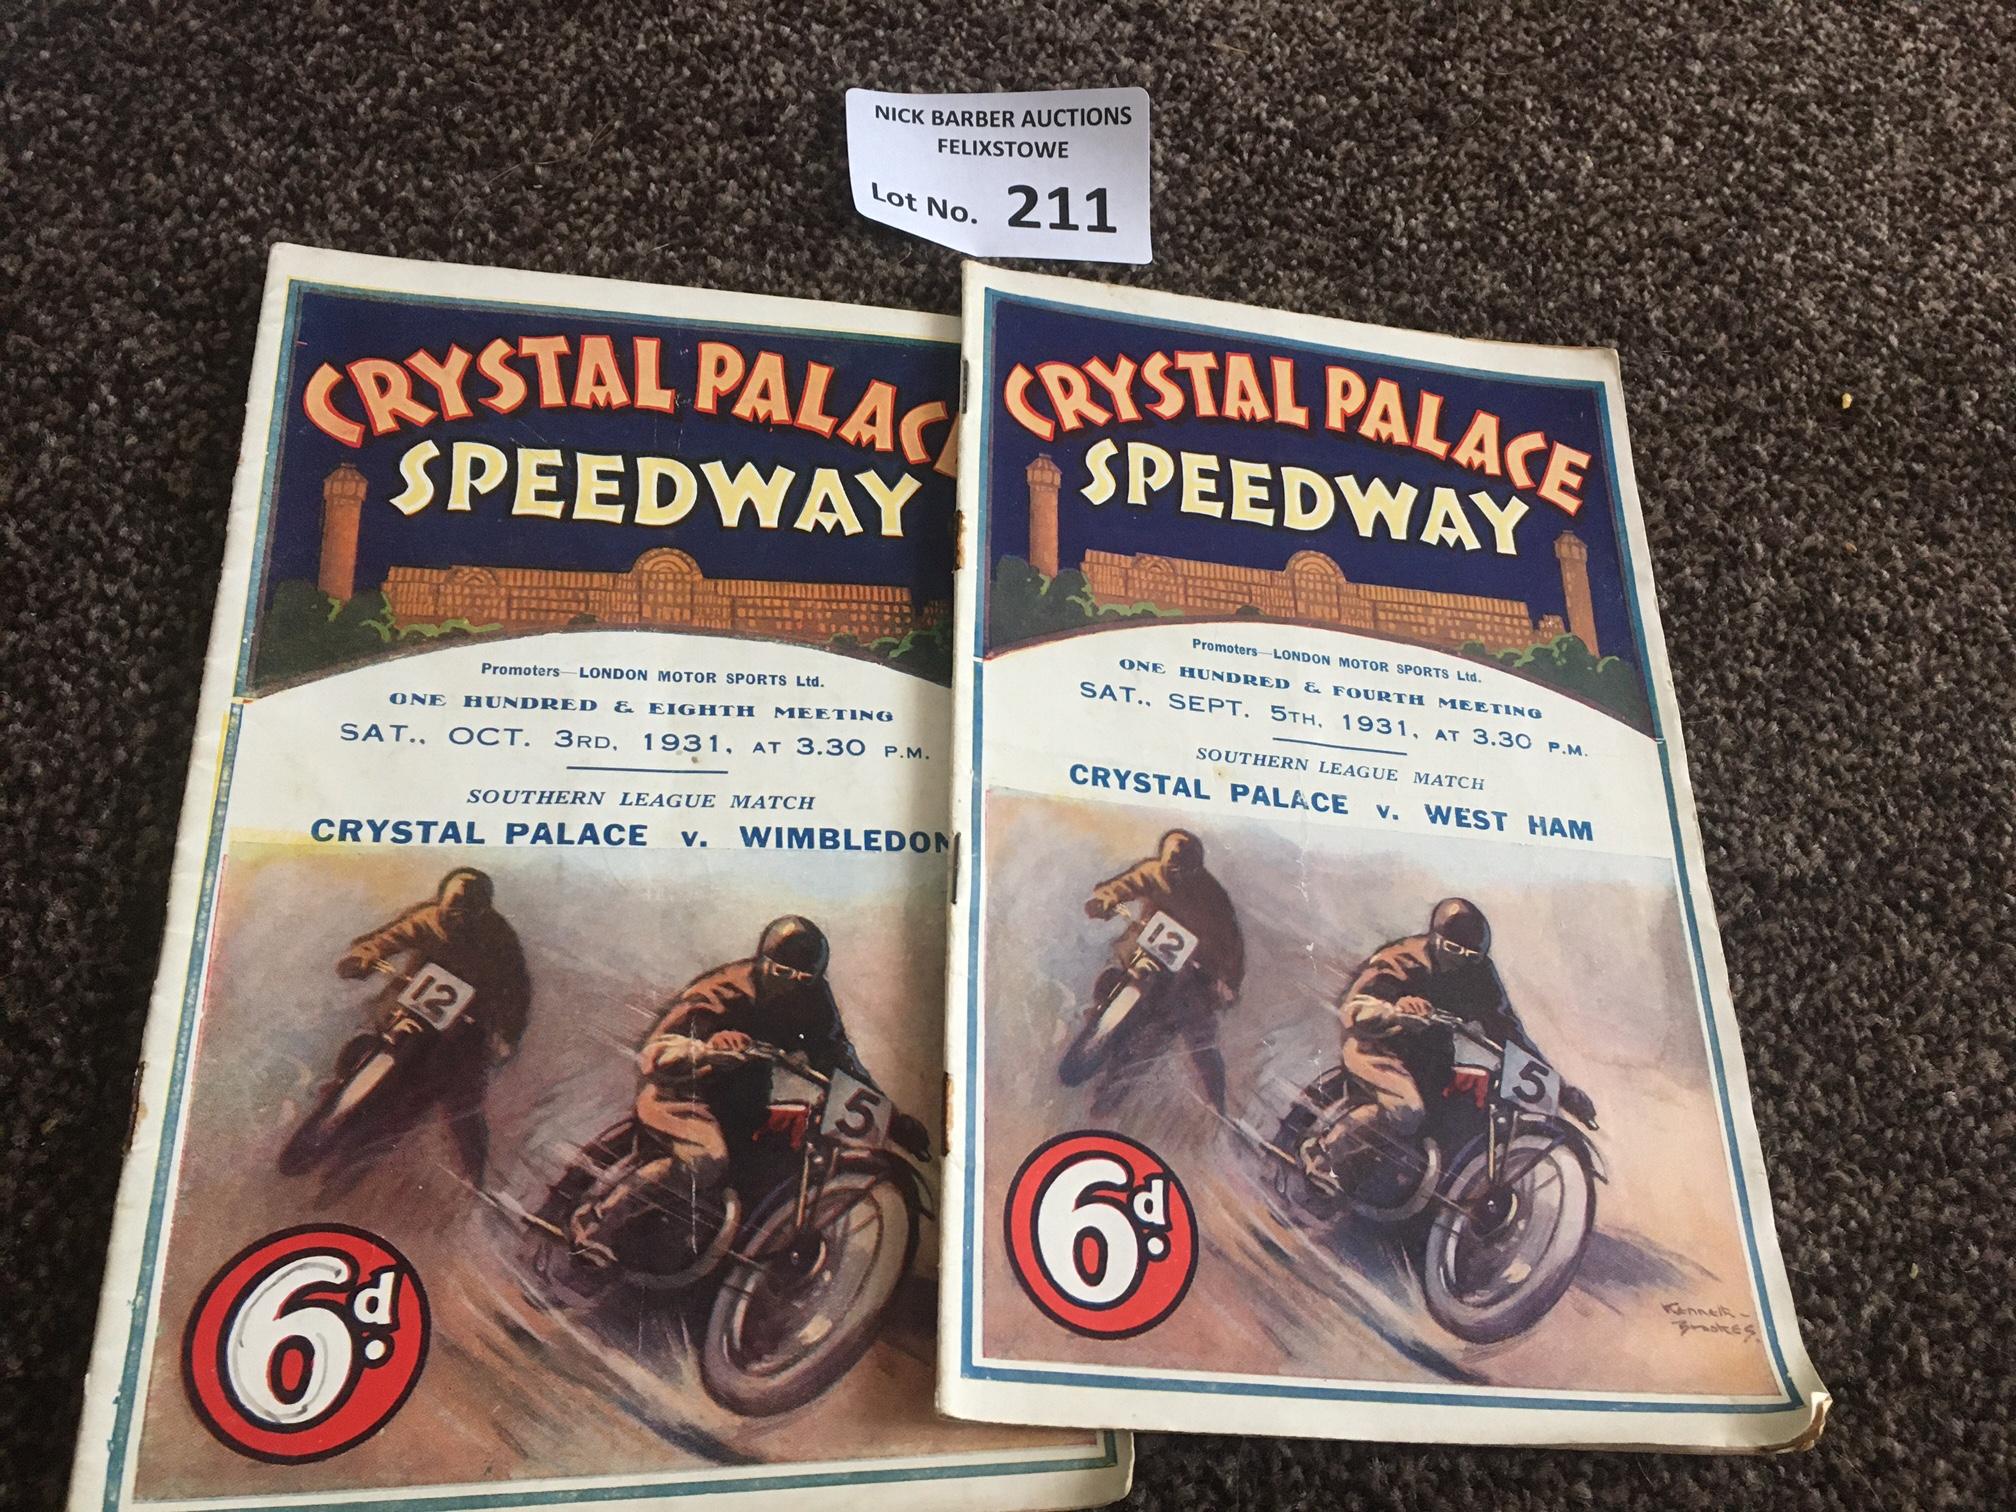 Speedway : Crystal Palace programmes (2) v Wimbled